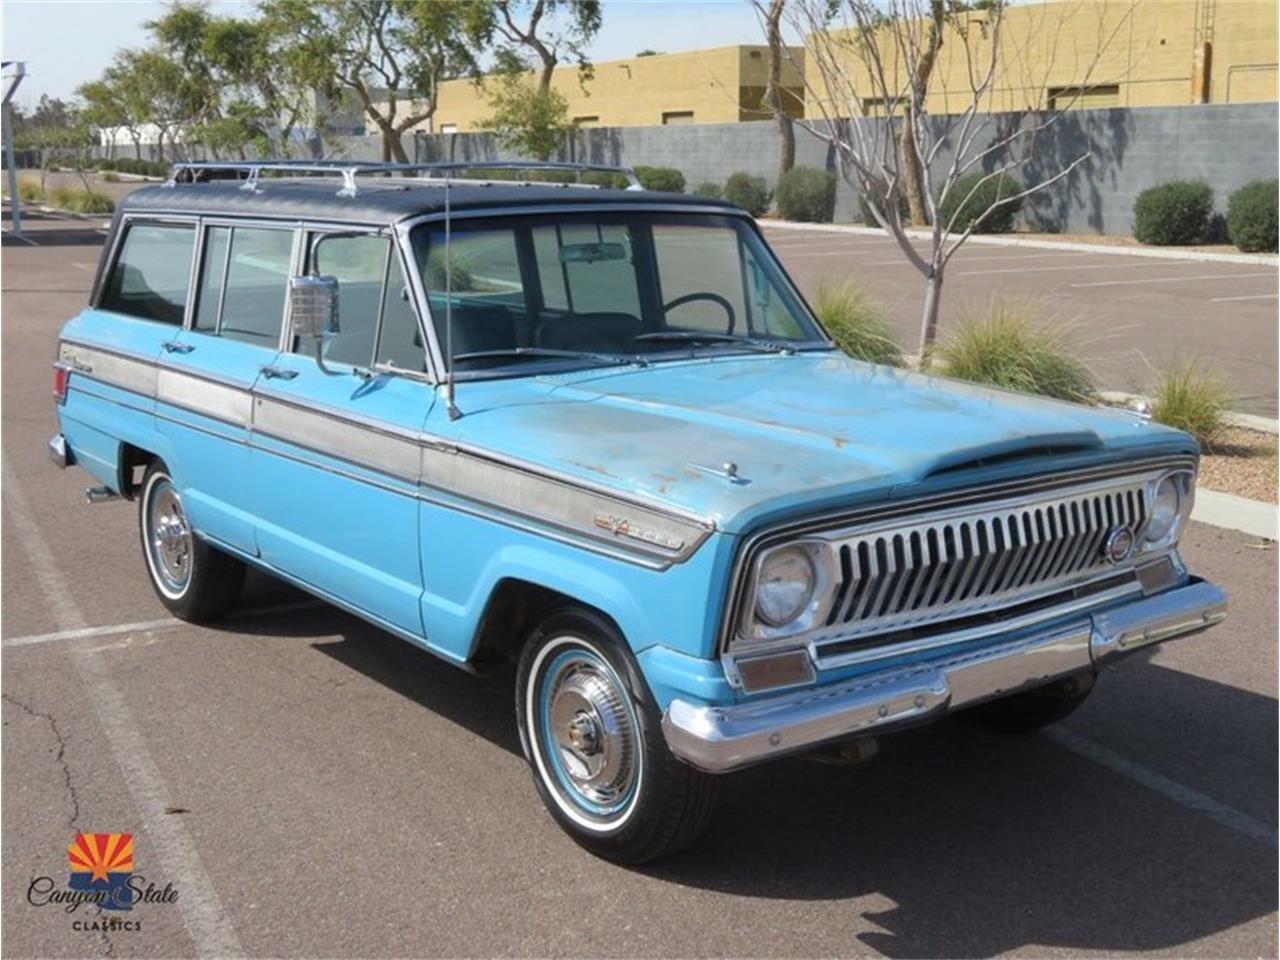 Jeep Wagoneer For Sale >> For Sale 1966 Jeep Wagoneer In Tempe Arizona